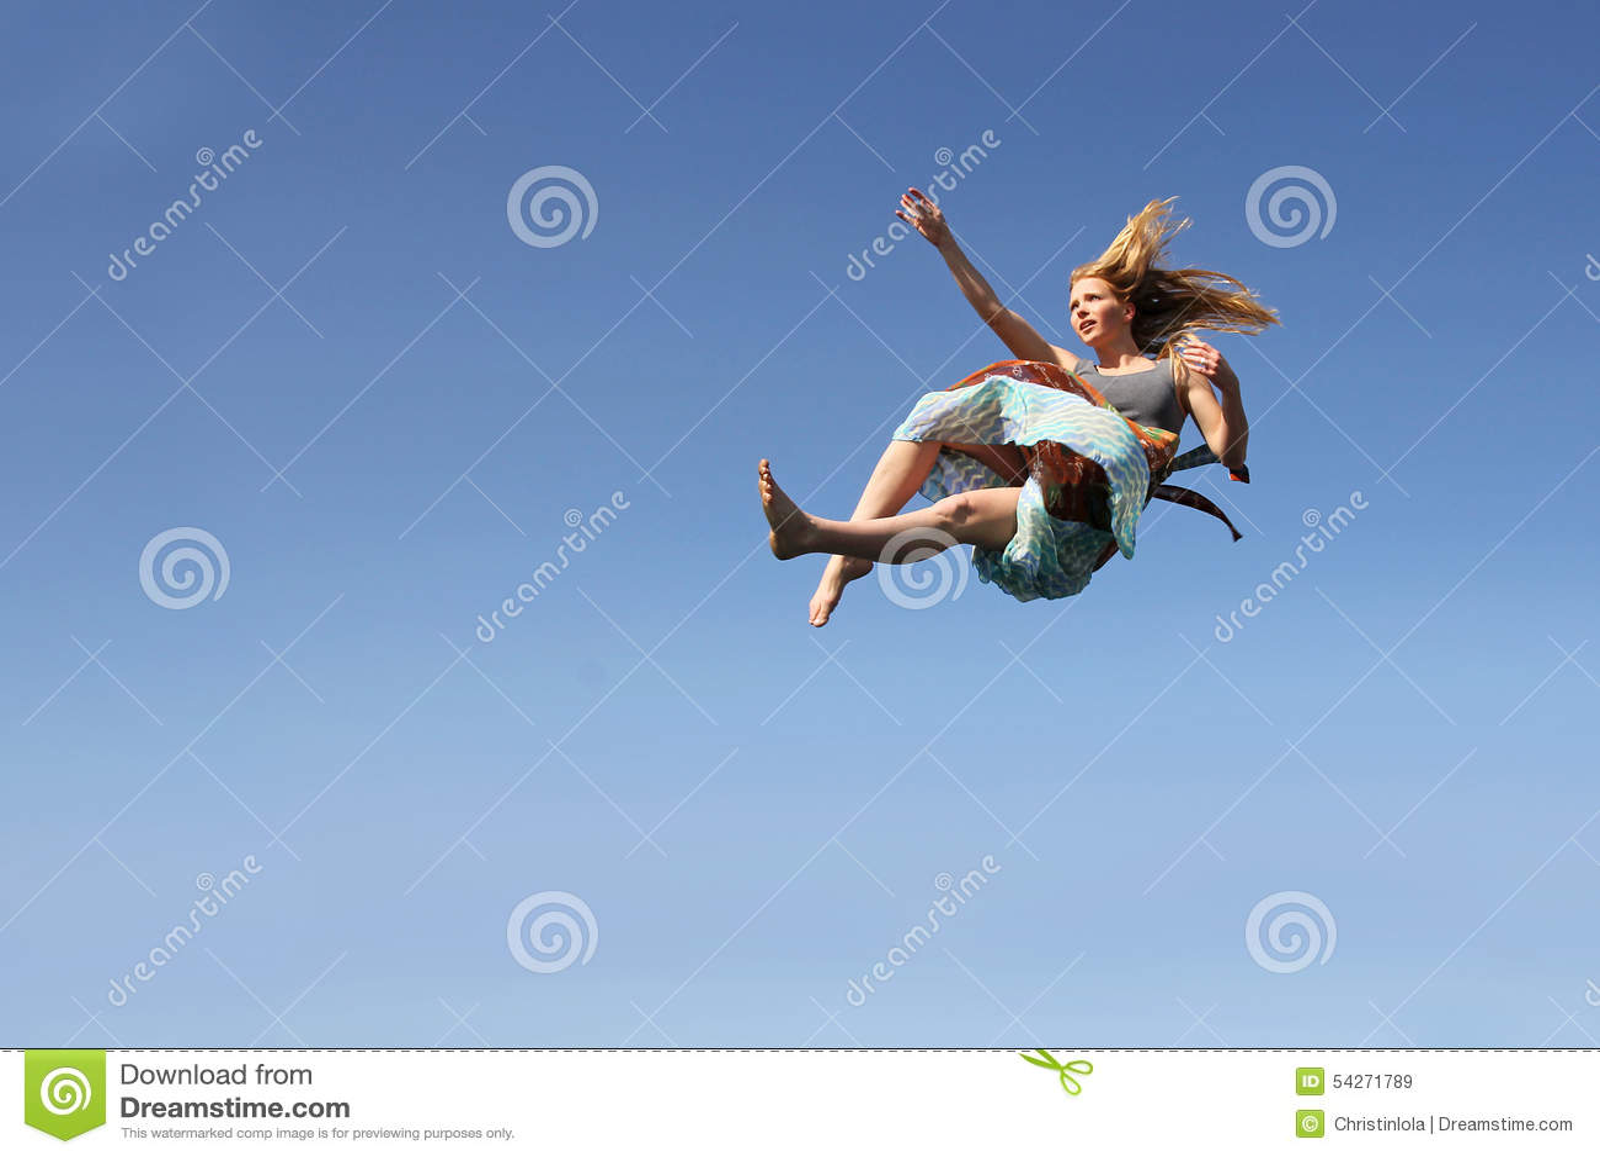 Woman Falling Through The Sky Stock Photo - Image: 54271789